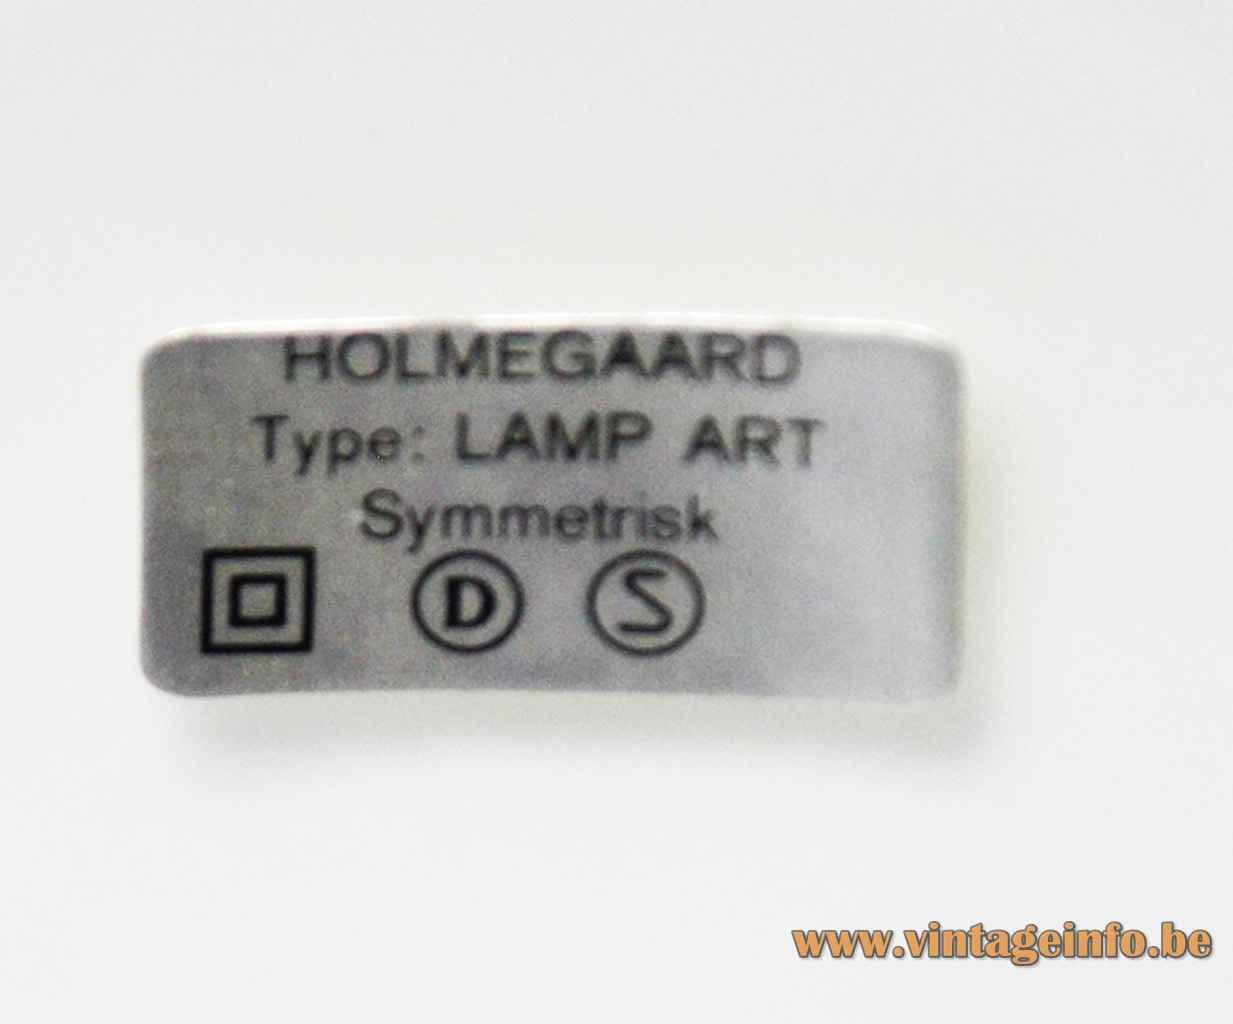 Michael Bang Holmegaard table lamp rectangular paper label Type: Lamp Art Symmetrisk 1972 design Denmark